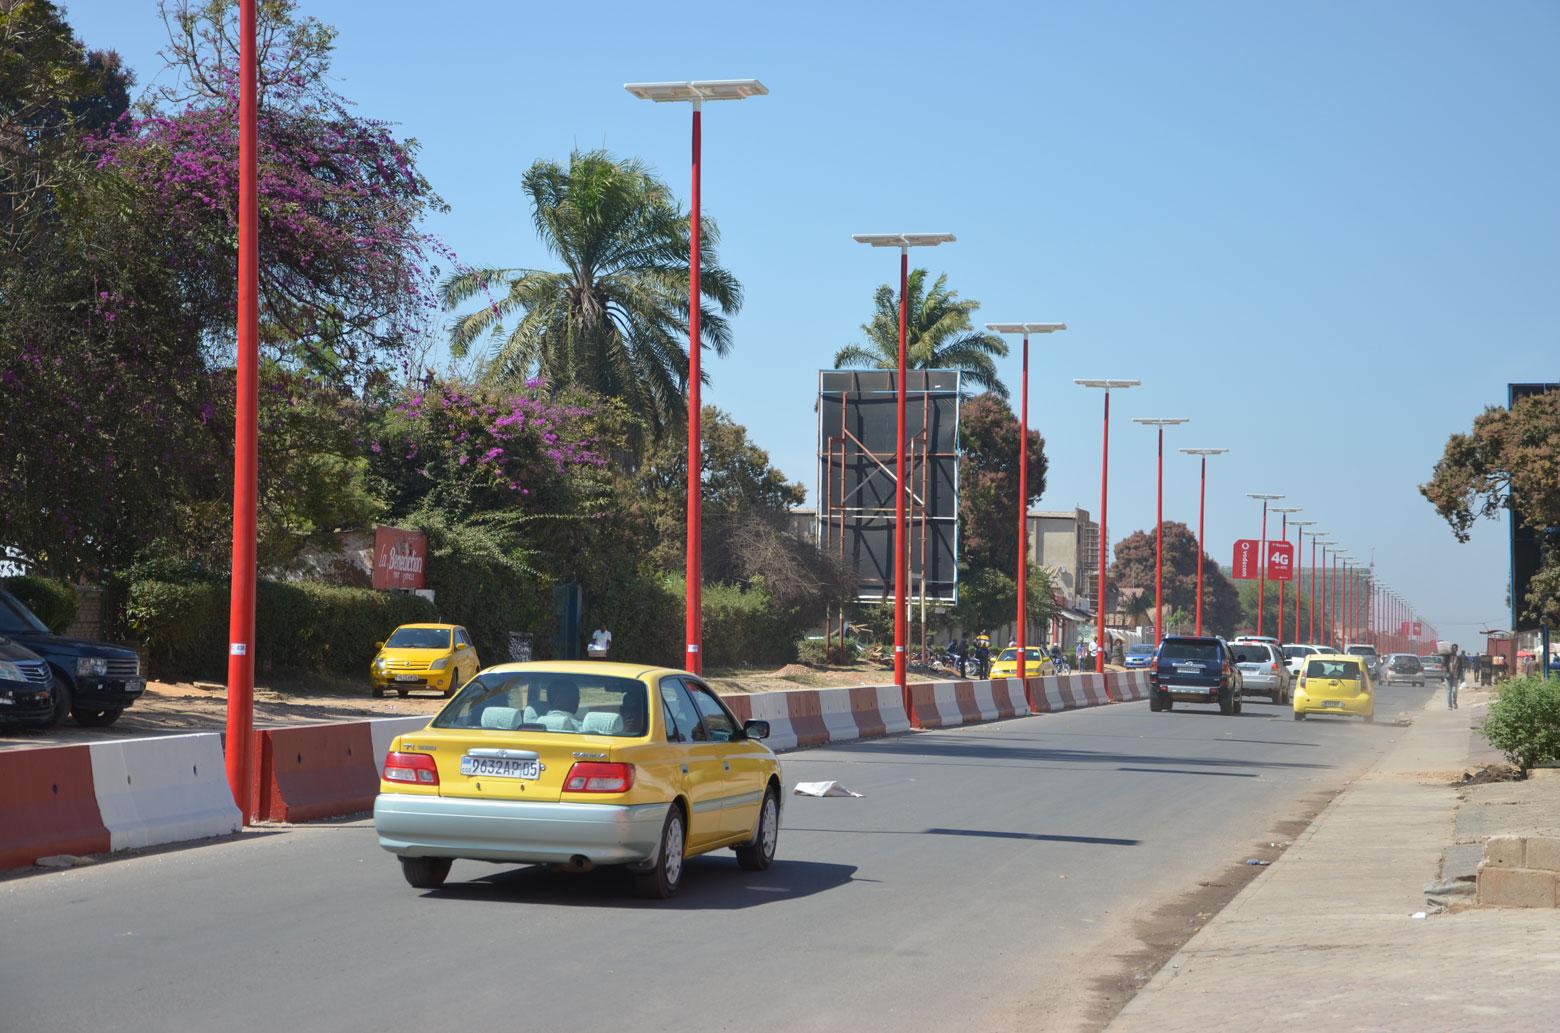 L'avenue Kasa-Vubu à Lubumbashi après rénovation en 2019